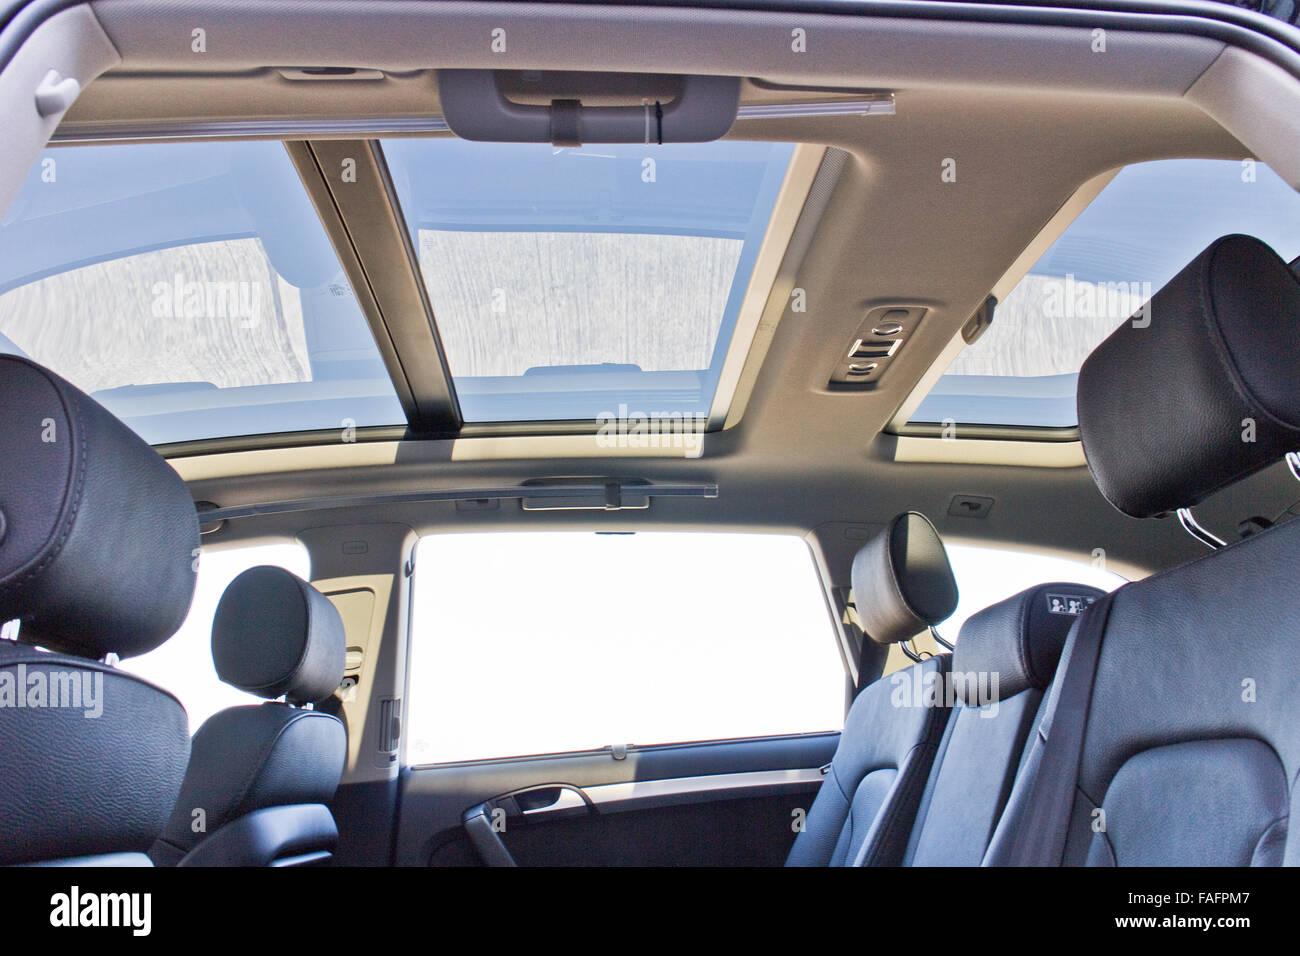 Hong Kong, China Jan 22, 2014 : Audi Q7 3 0T Quattro SUV